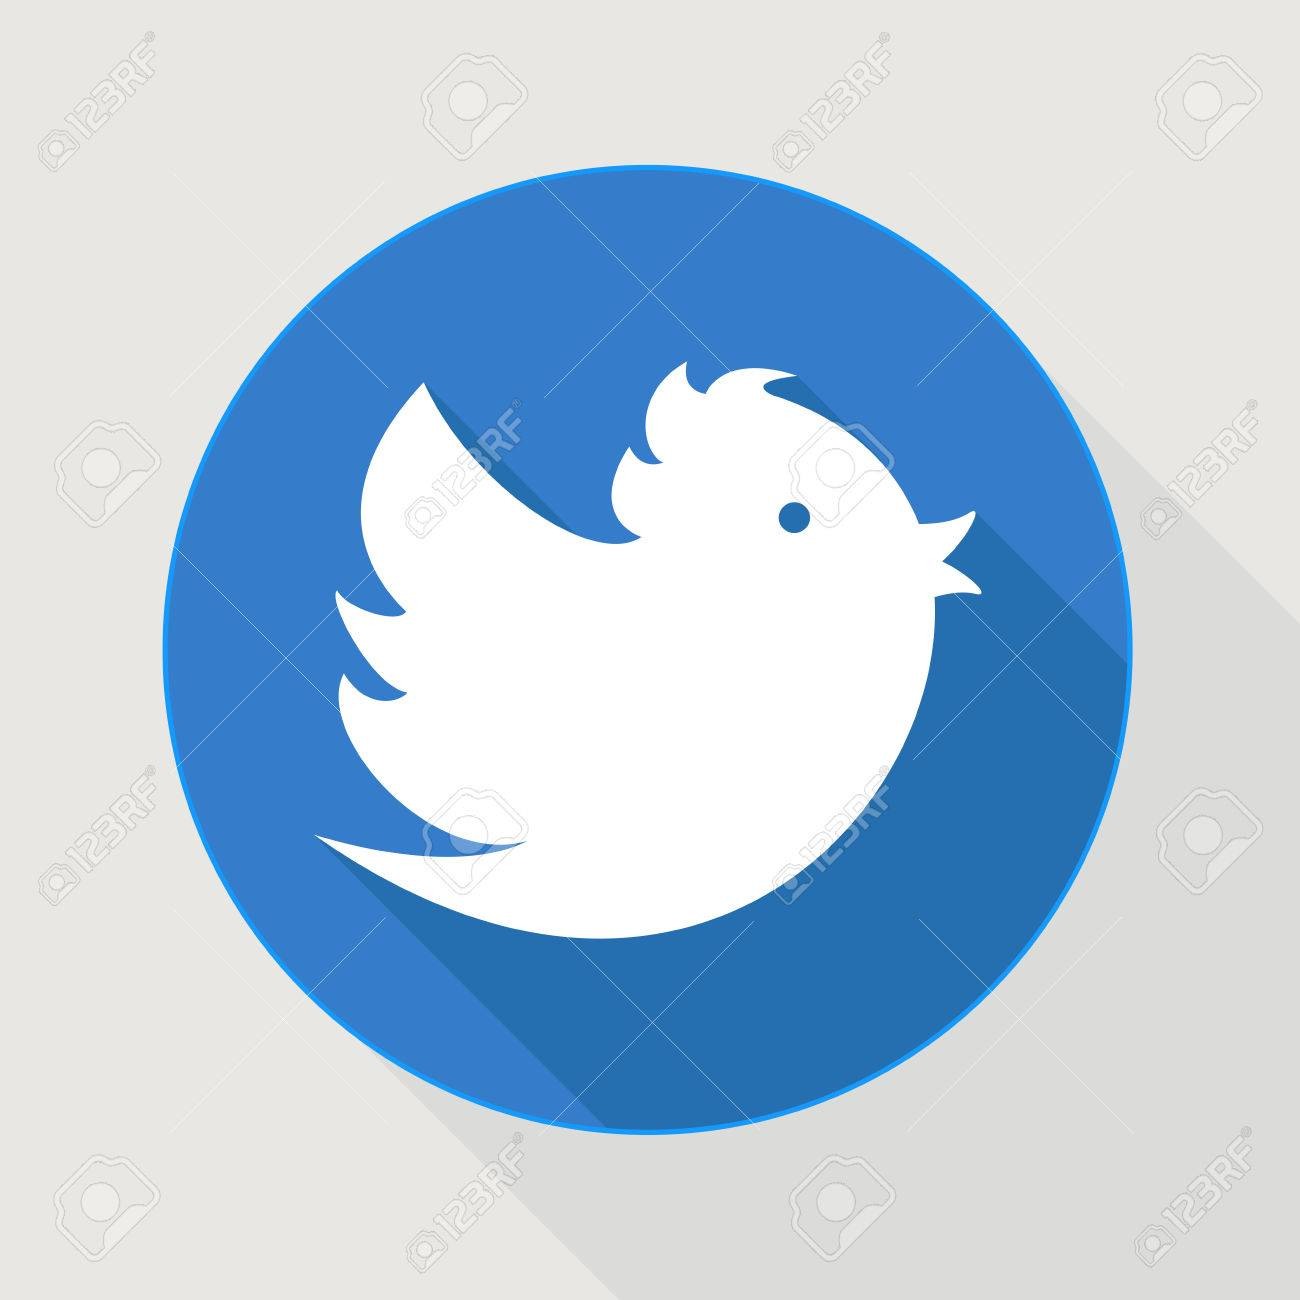 Flying blue twitter bird - 33530630